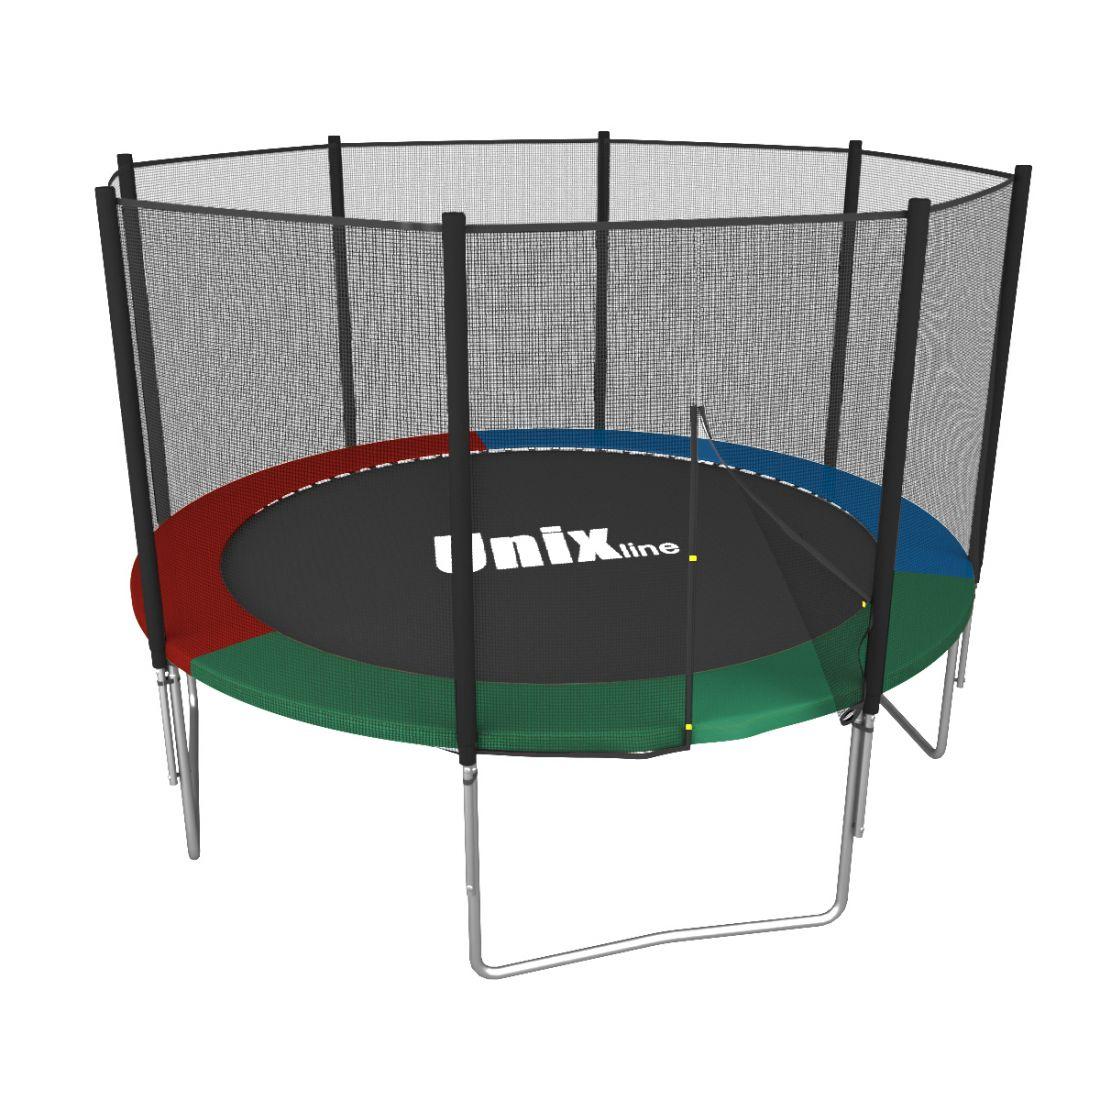 Батут Unix line Simple 6 ft Color/Green (outside)